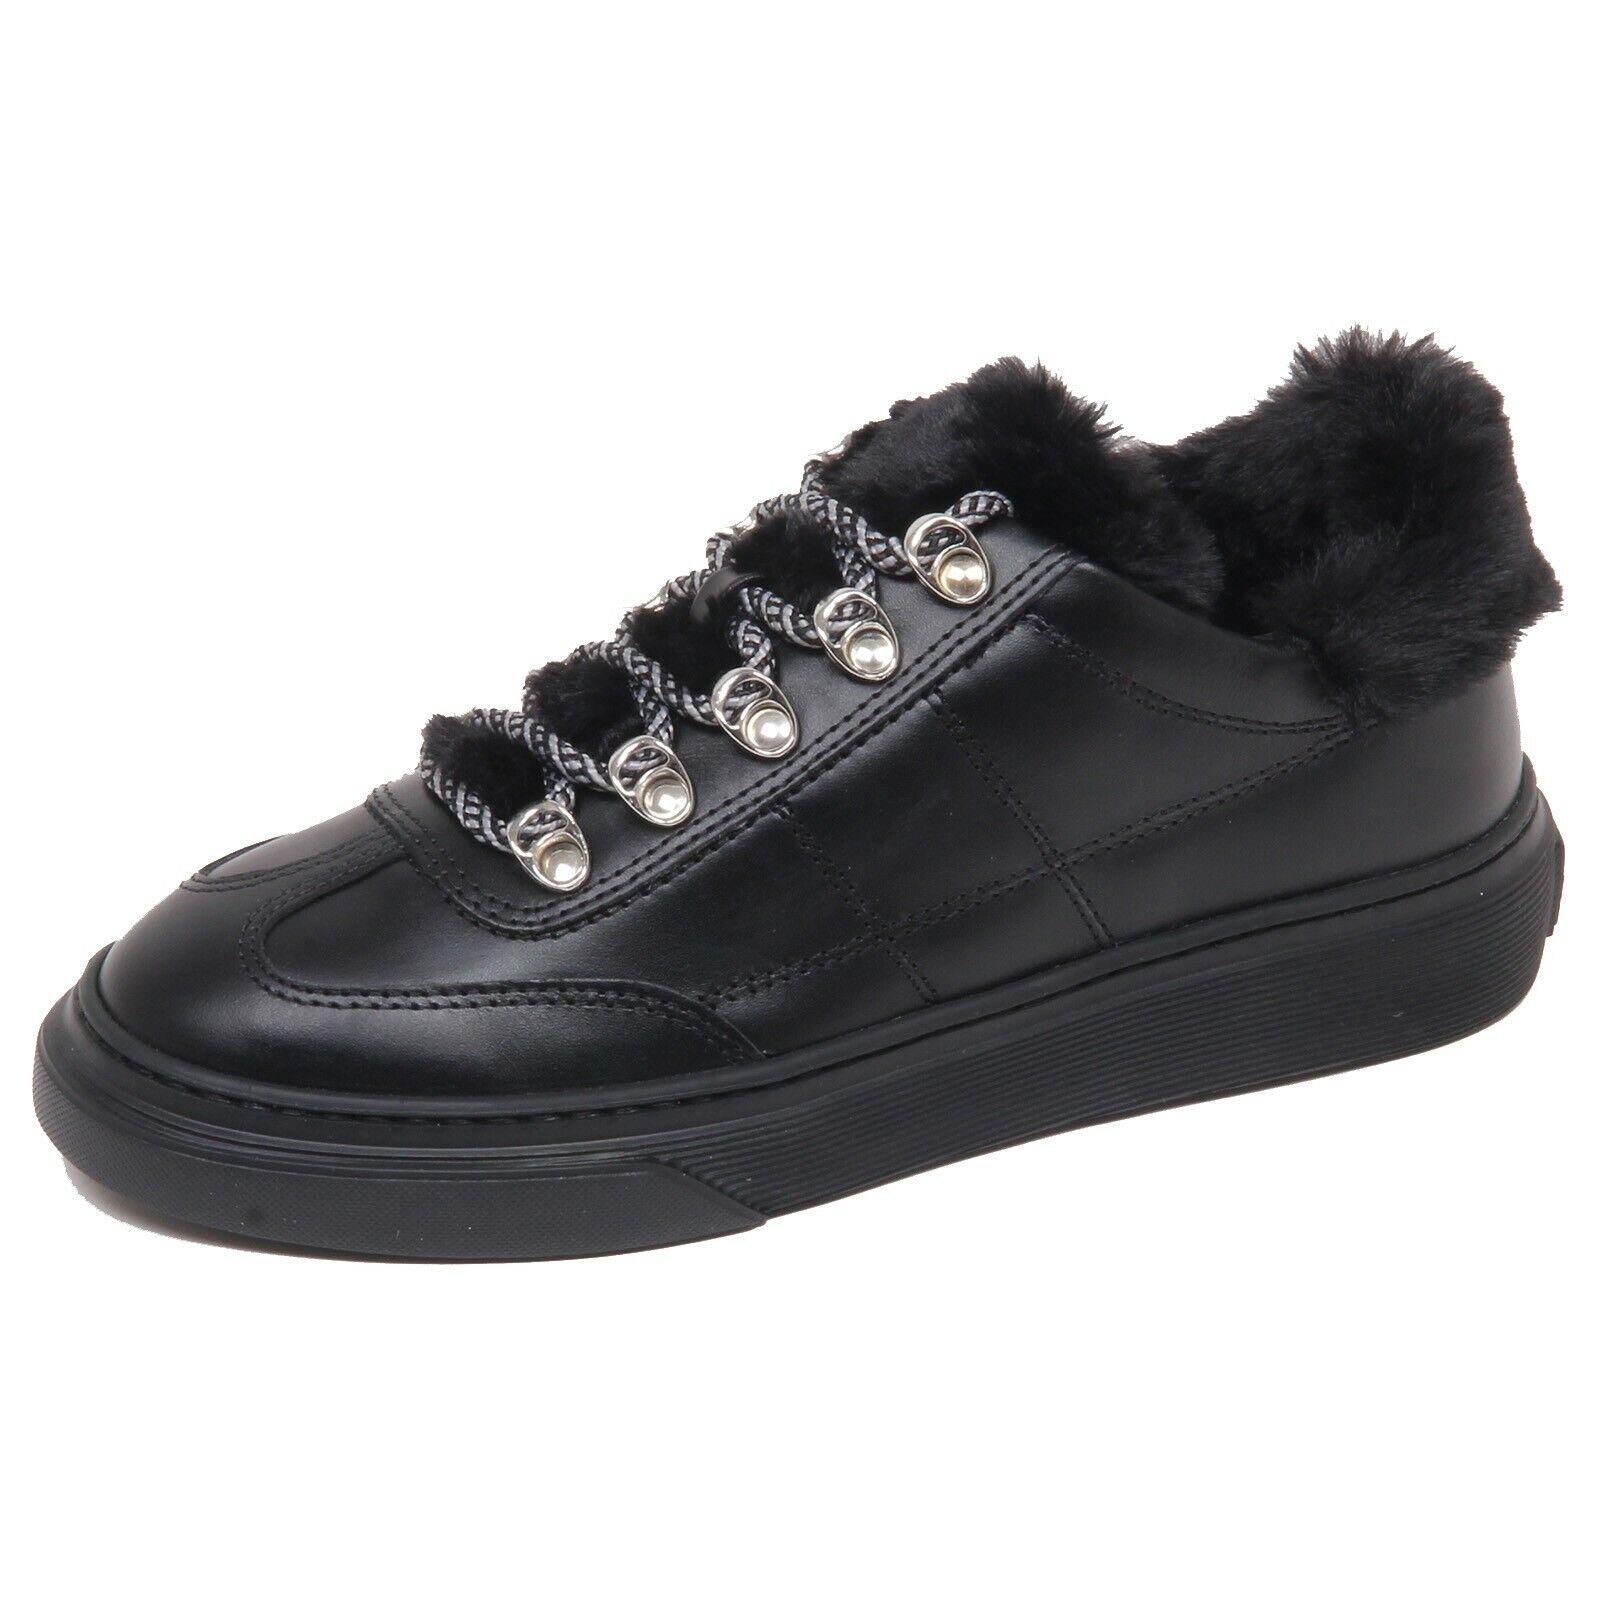 F6362 Turnschuhe damen schwarz HOGAN H365 leather eco fur inside schuhe woman